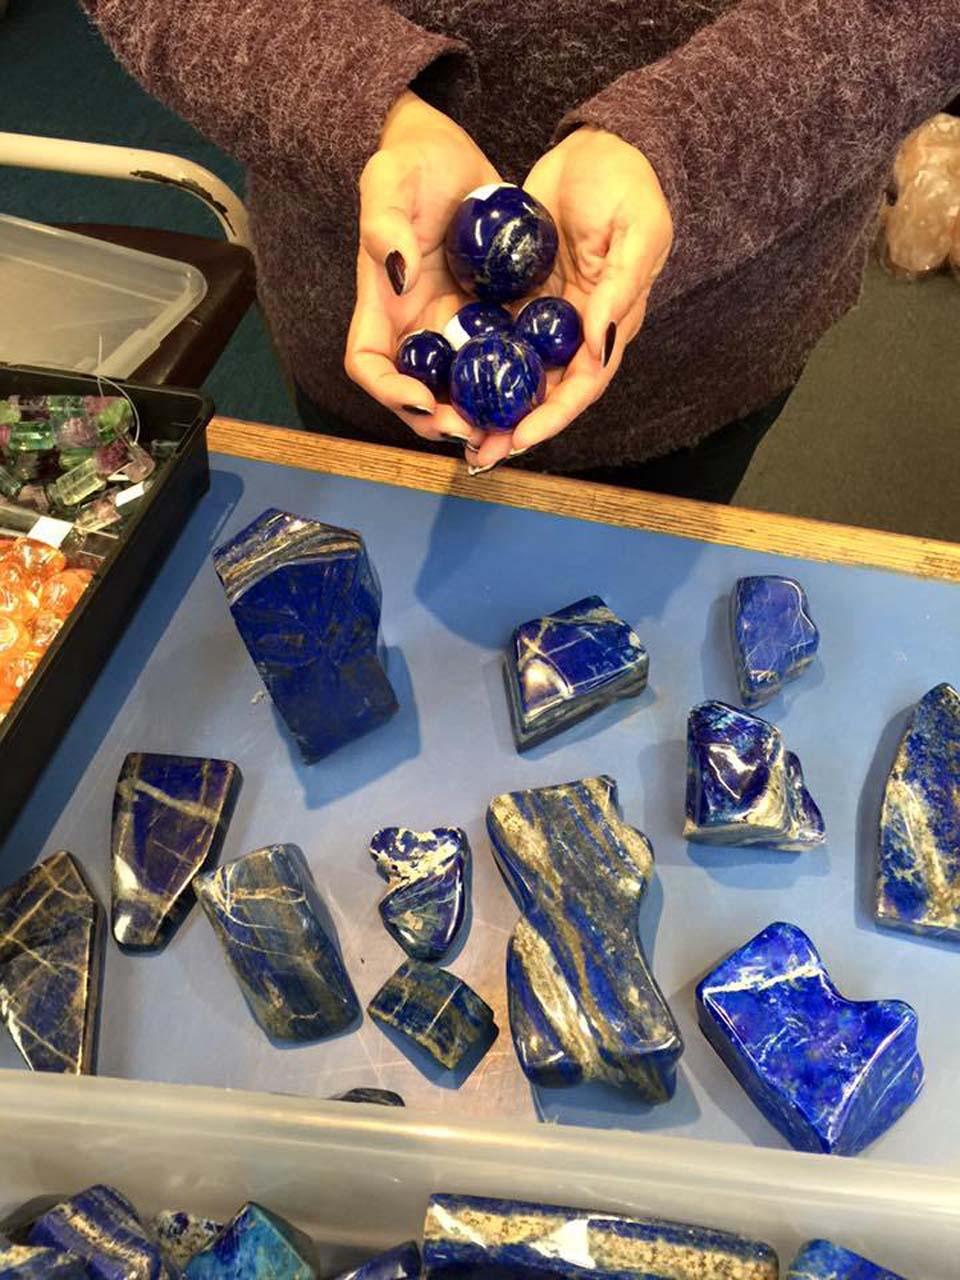 lapis lazuli spheres, crystals, meteorites, fossils, lapidary, gems, minerals